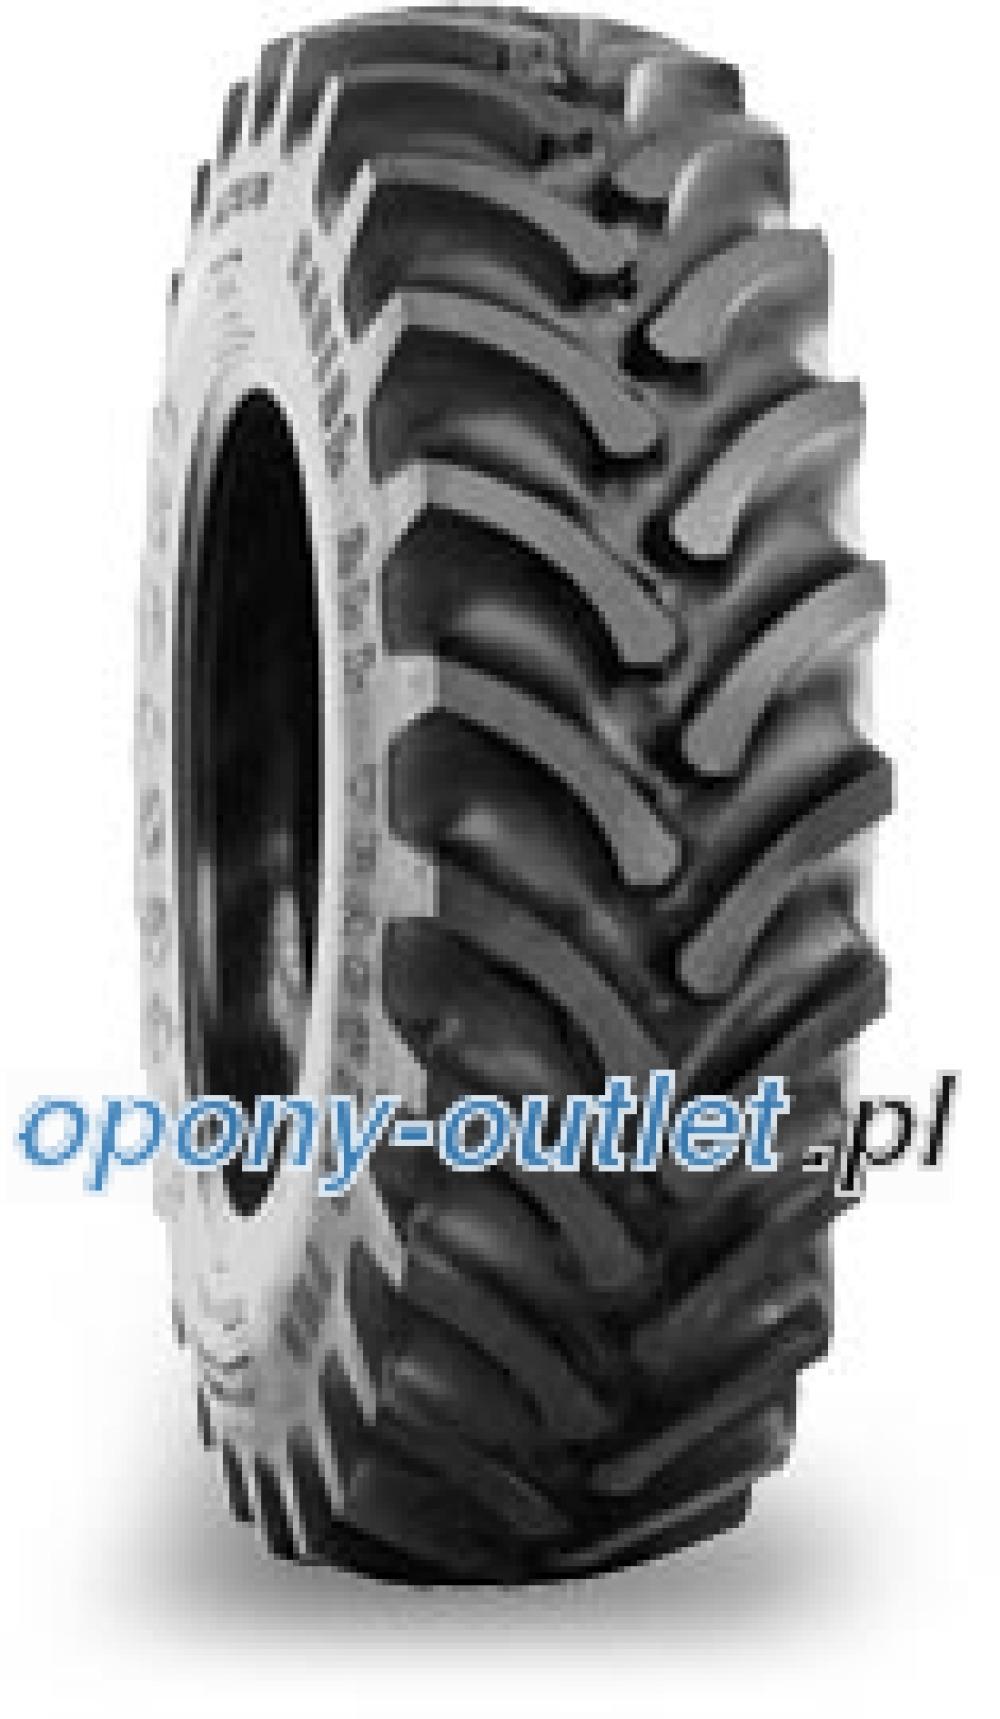 Firestone Radial All Traction Four-Wheel Drive ( 18.4 R26 140A8 TL podwójnie oznaczone 140B, Tragfähigkeit ** )